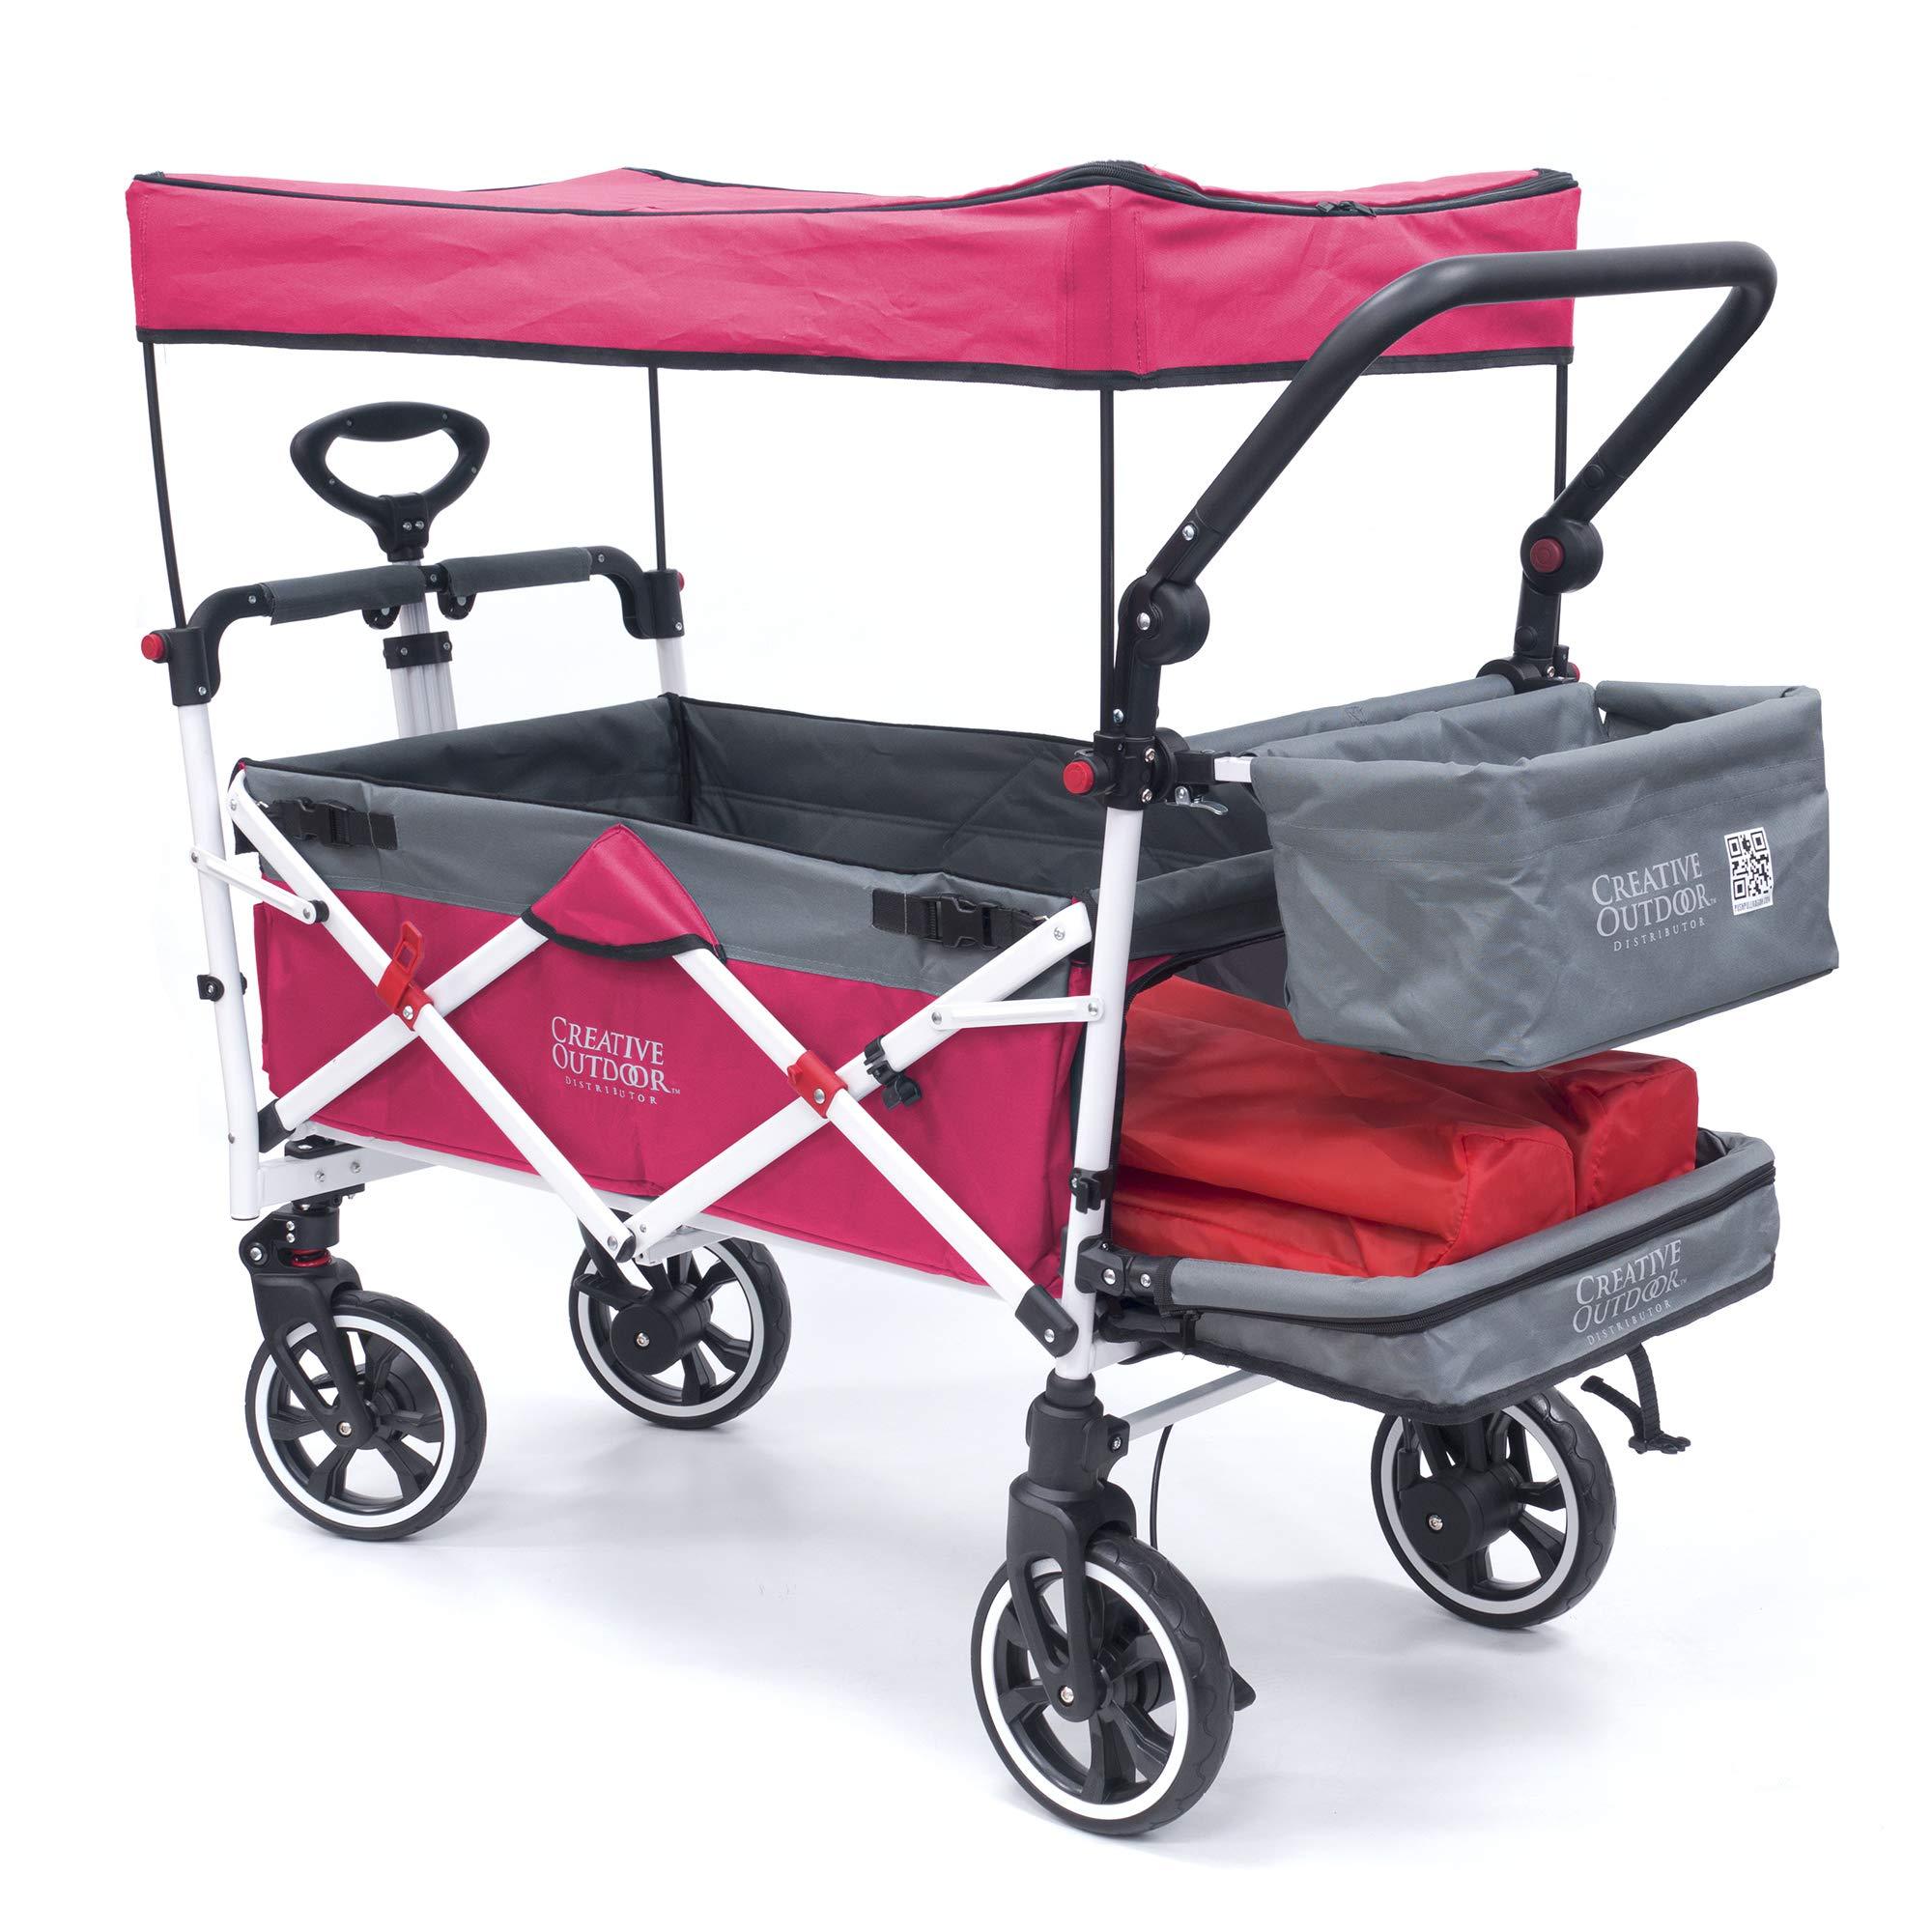 Creative Outdoor Push Pull Collapsible Folding Wagon Stroller Cart for Kids   Titanium Series   Beach Park Garden & Tailgate (Pink)